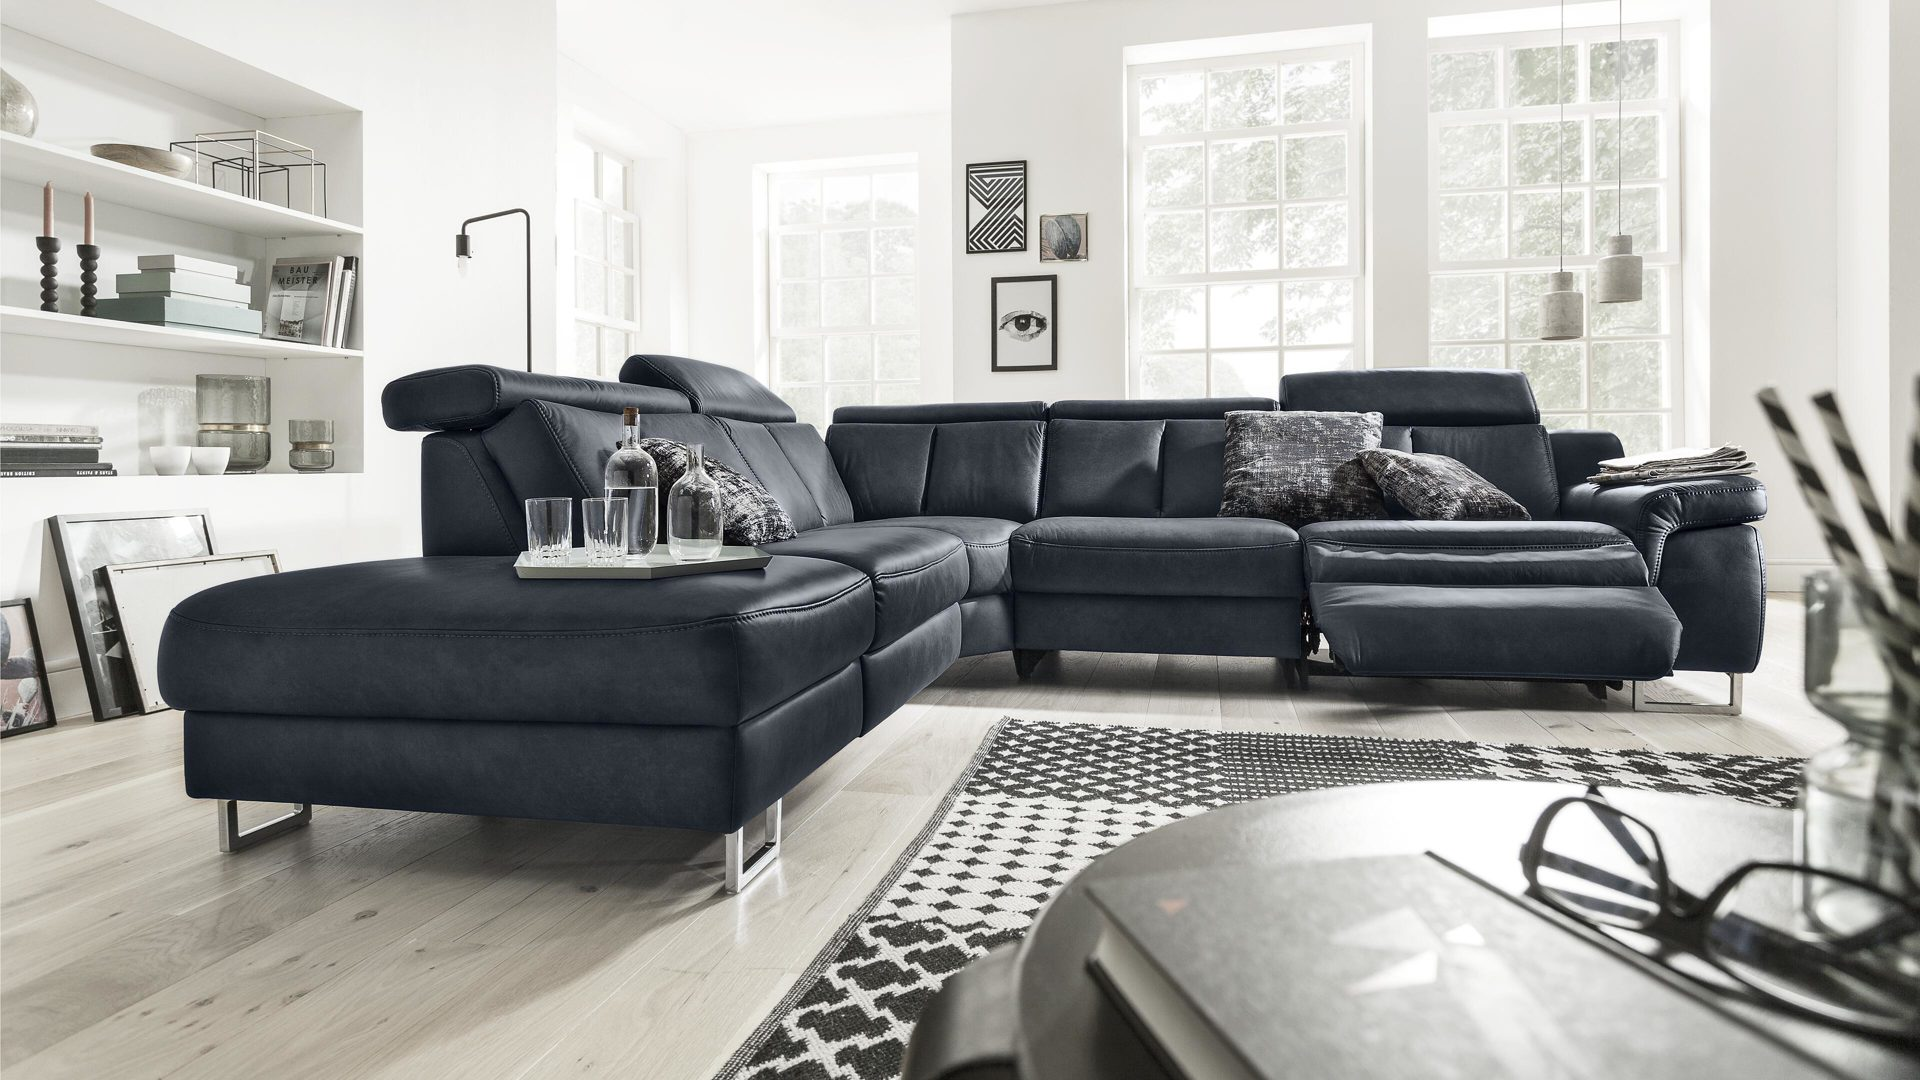 Interliving Sofa Serie 4050 Wohnlandschaft Nachtblaues Longlife